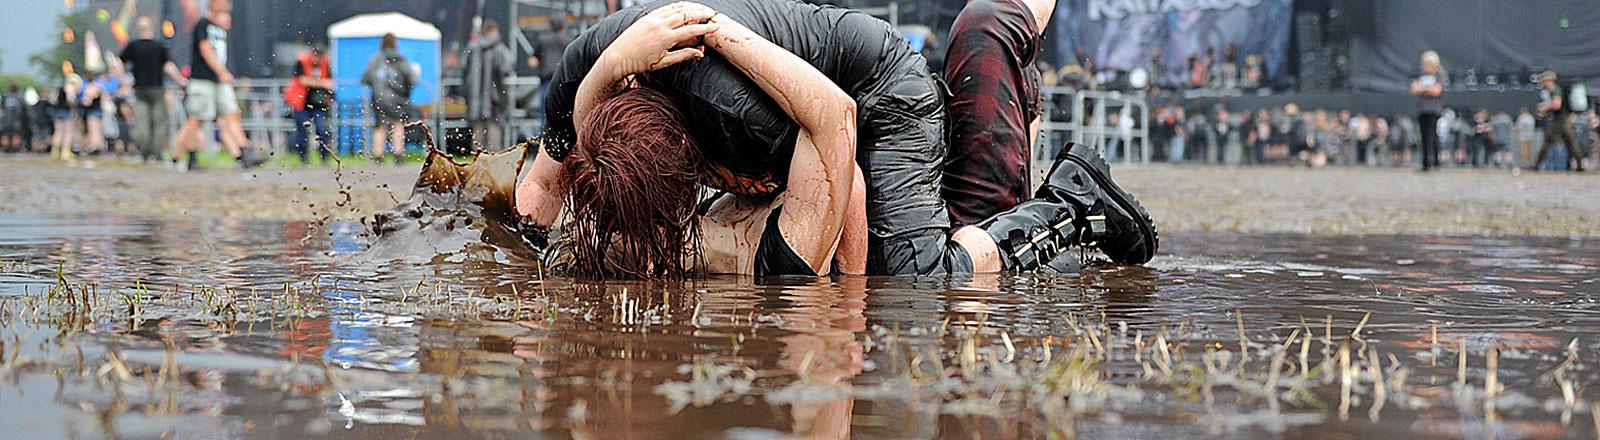 Zwei Menschen im Matsch beim Wacken Festival